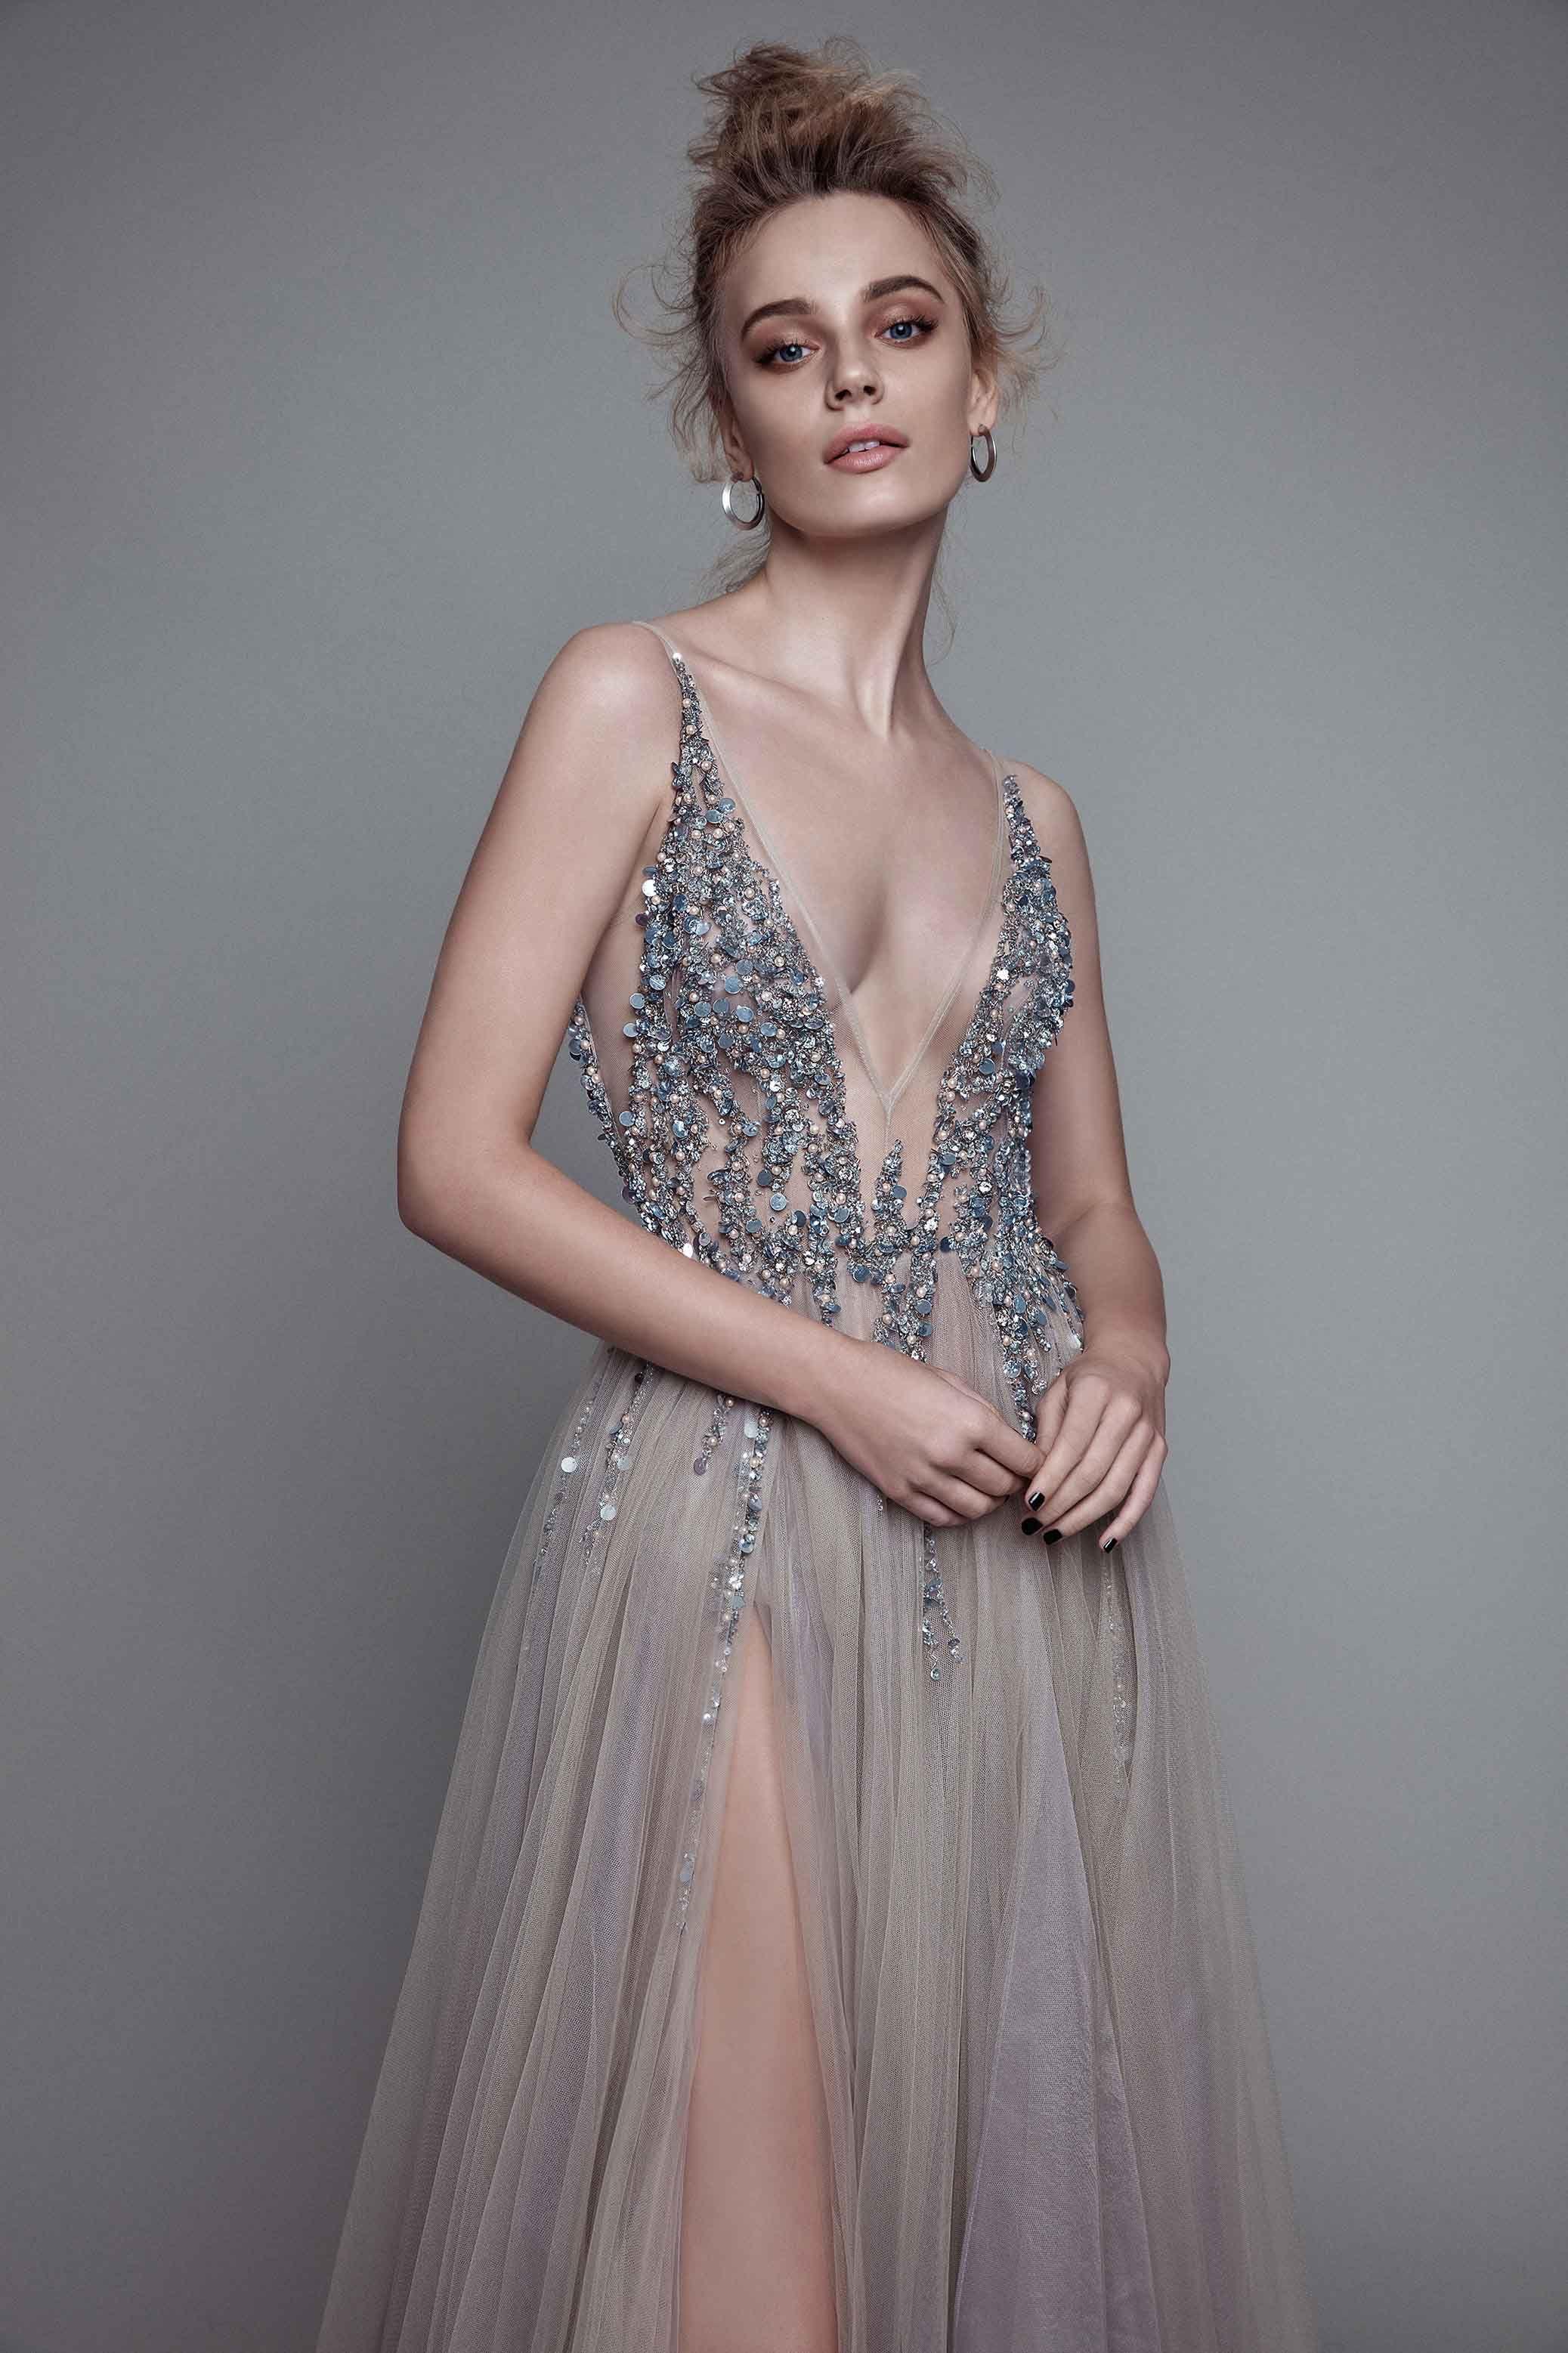 Ball gown gray prom dresses grey loncharming prom dresslongsleeves